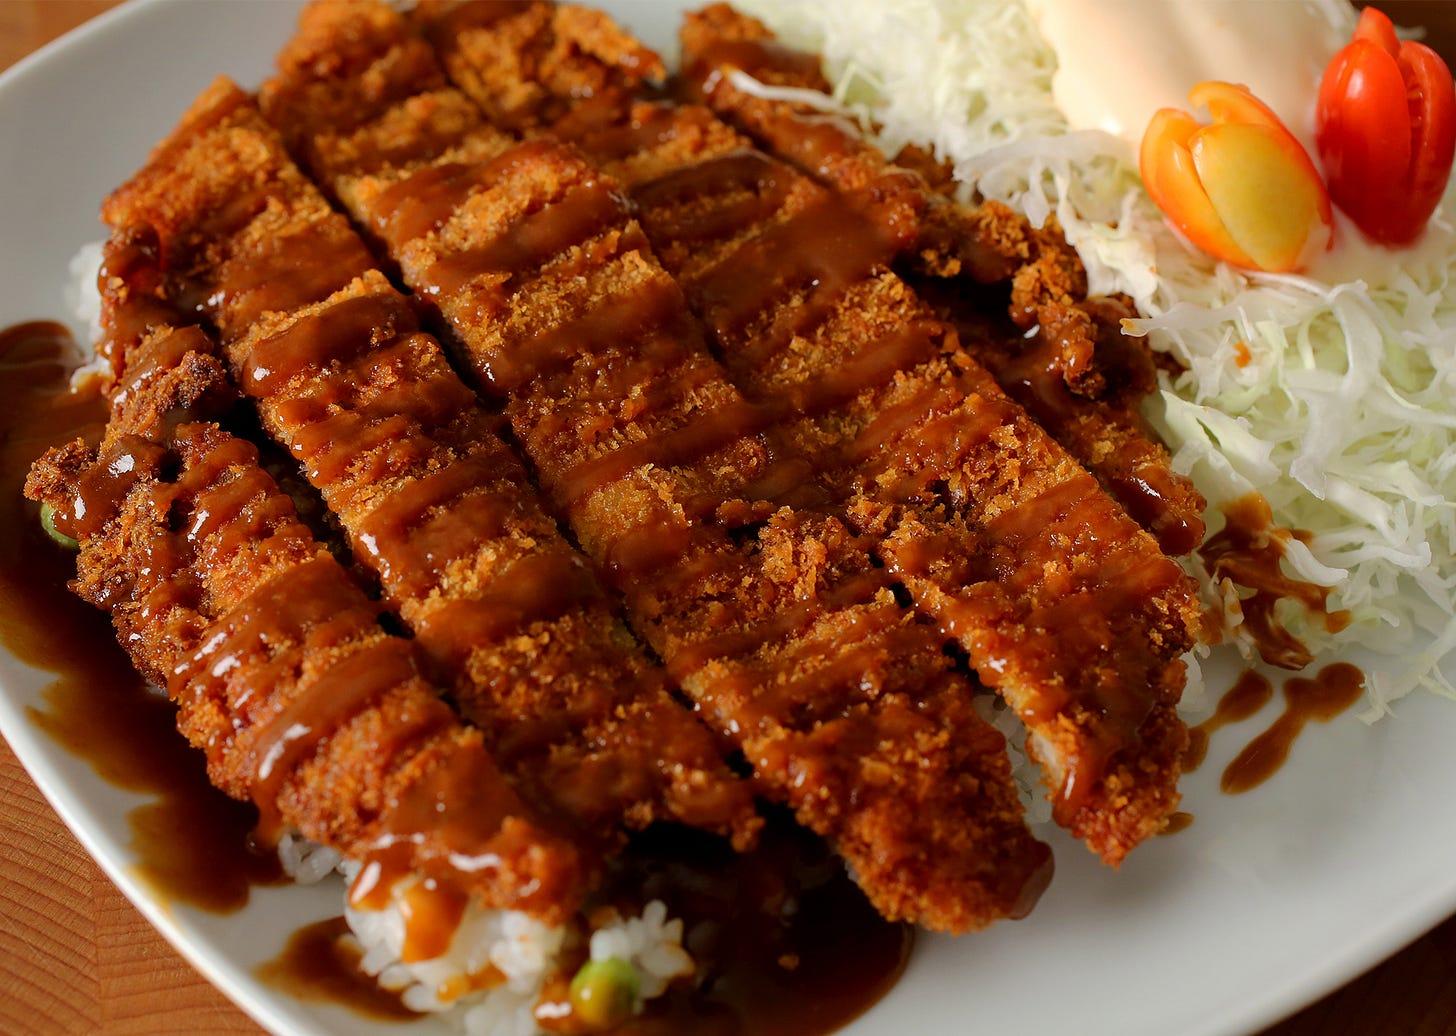 Pork cutlet (Donkkaseu) recipe - Maangchi.com